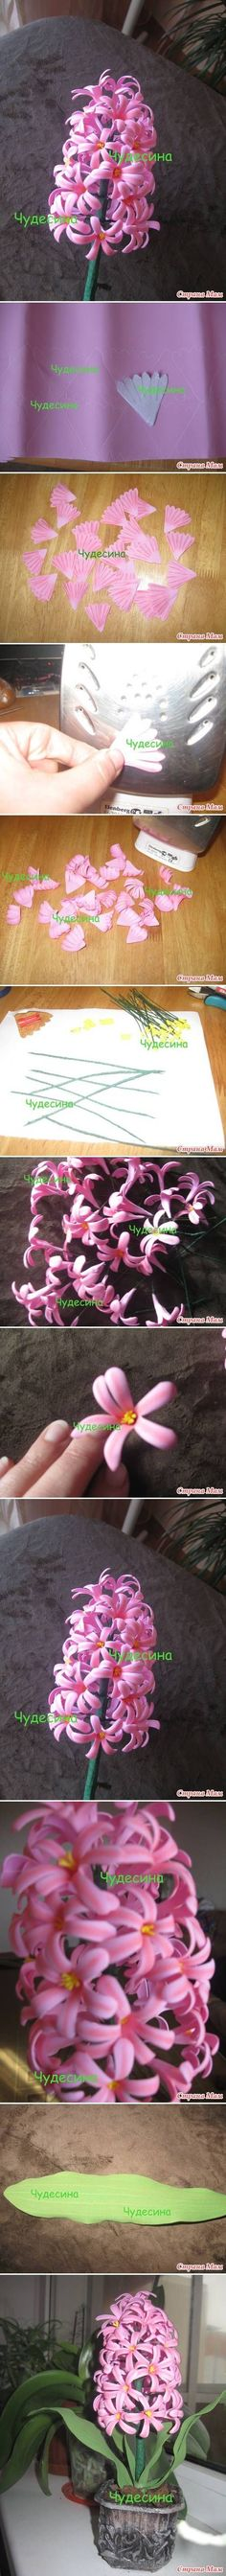 DIY Hyacinth Flower DIY Projects | UsefulDIY.com Follow Us on Facebook ==> http://www.facebook.com/UsefulDiy